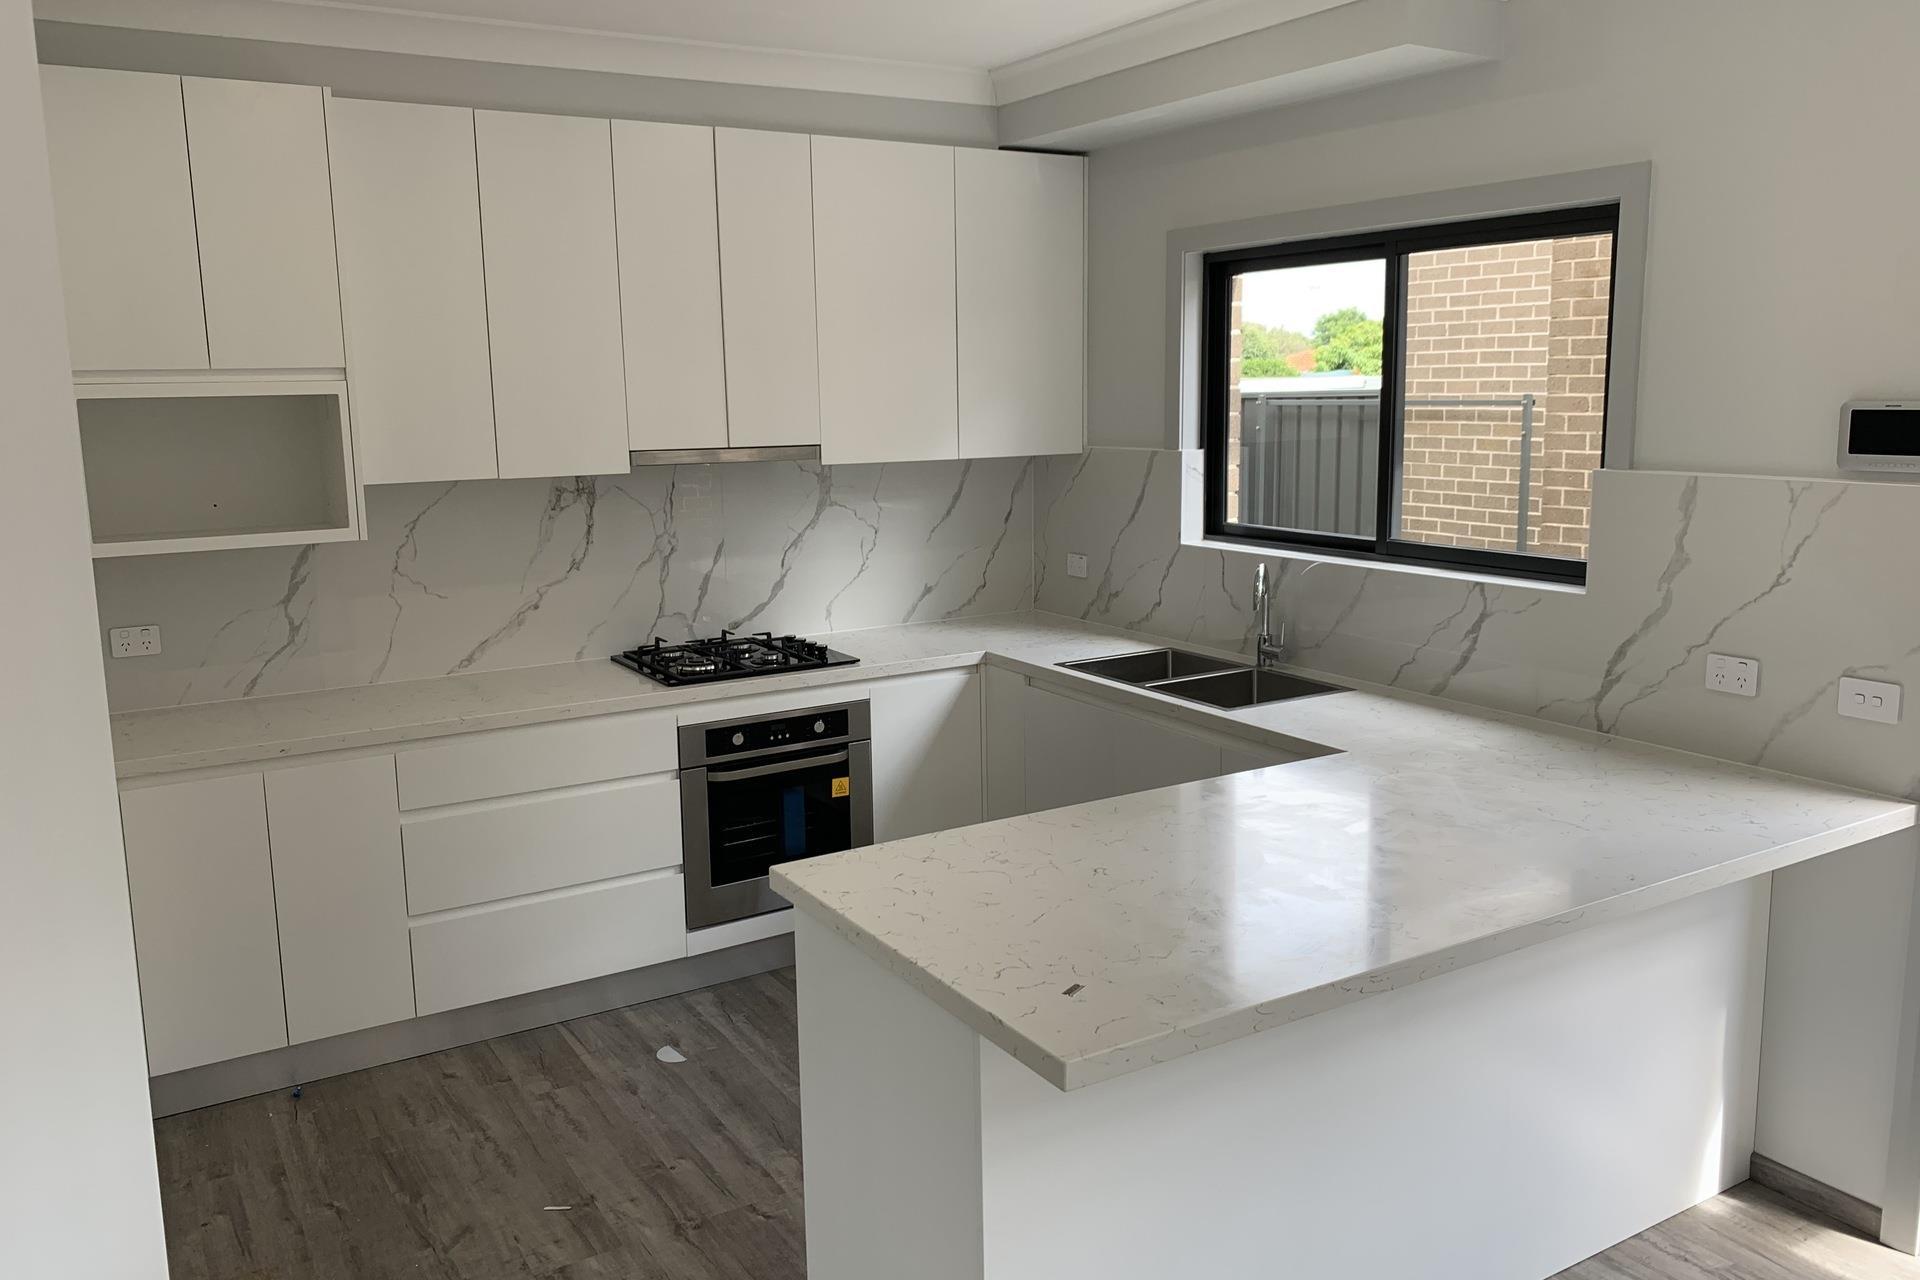 79 Atkinson St, Liverpool, NSW 2170